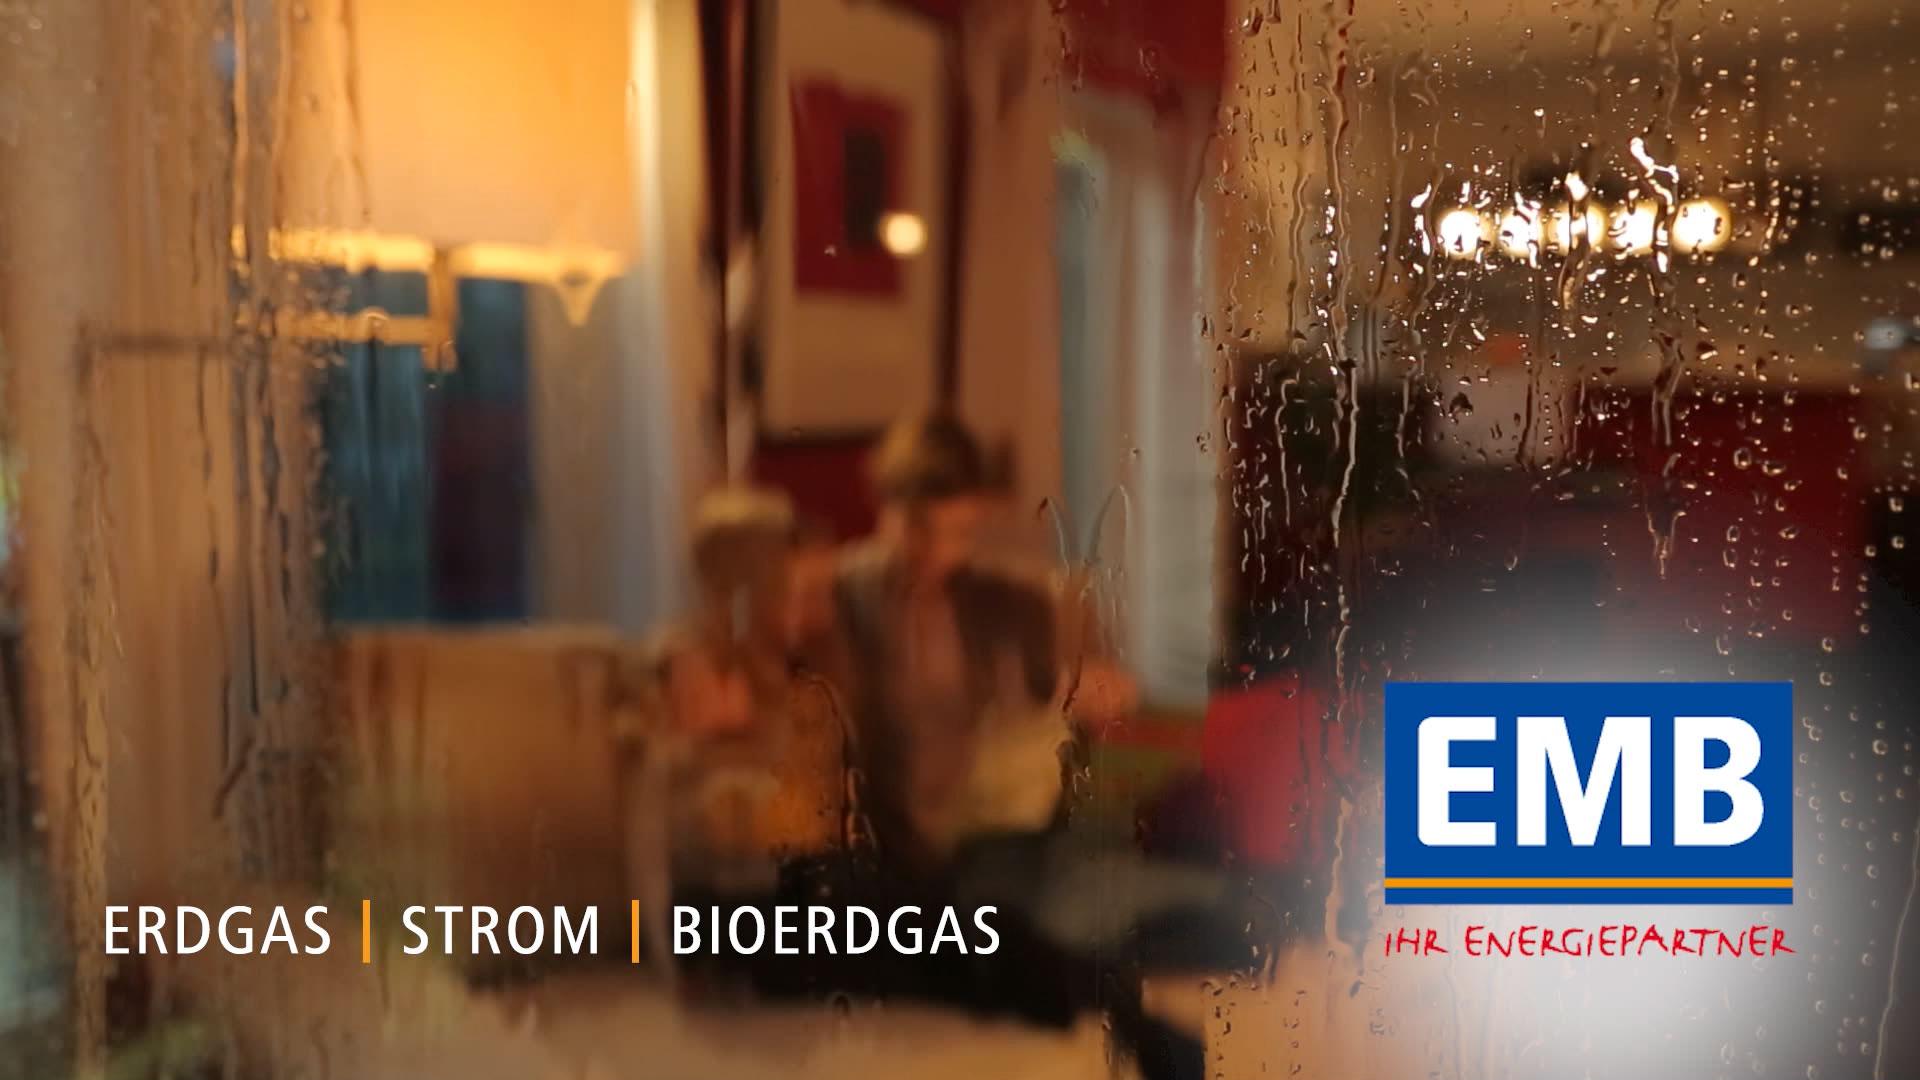 EMB im RBB